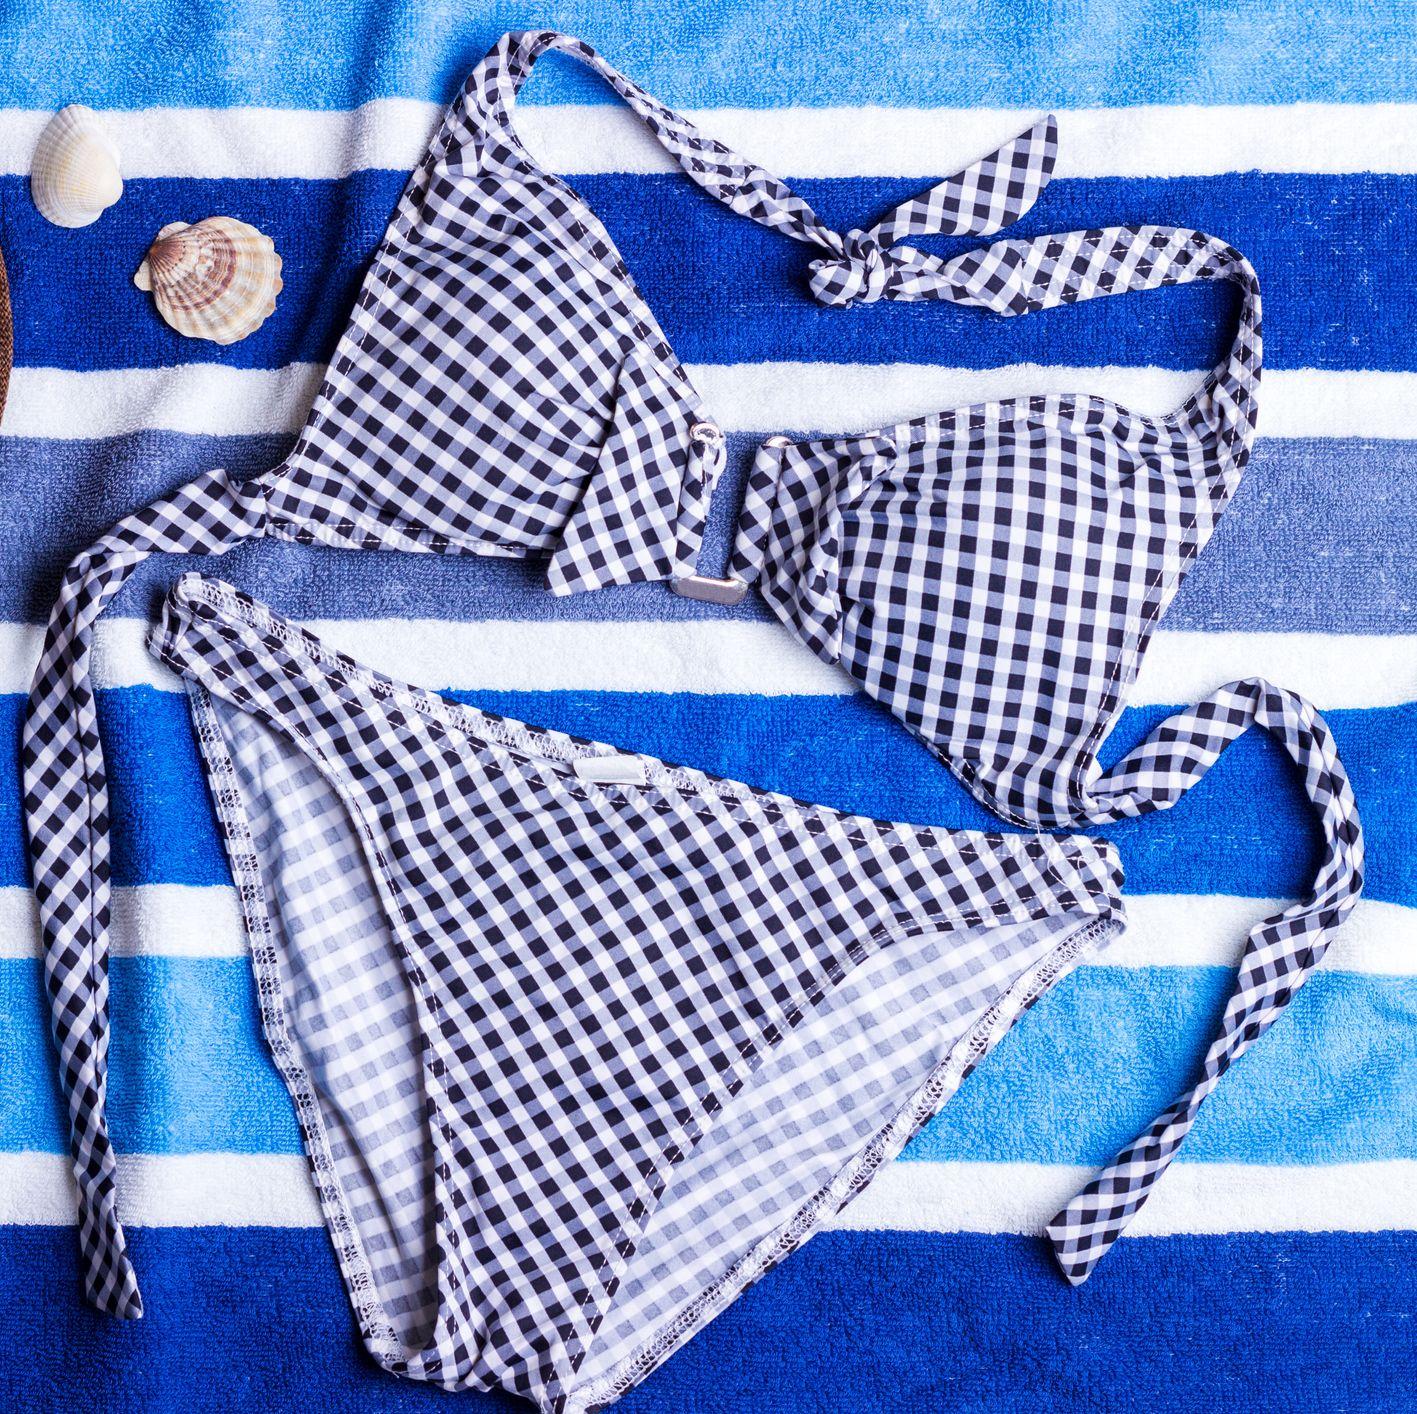 High Angle View Of Bikini With Hat And Seashells On Beach Towel